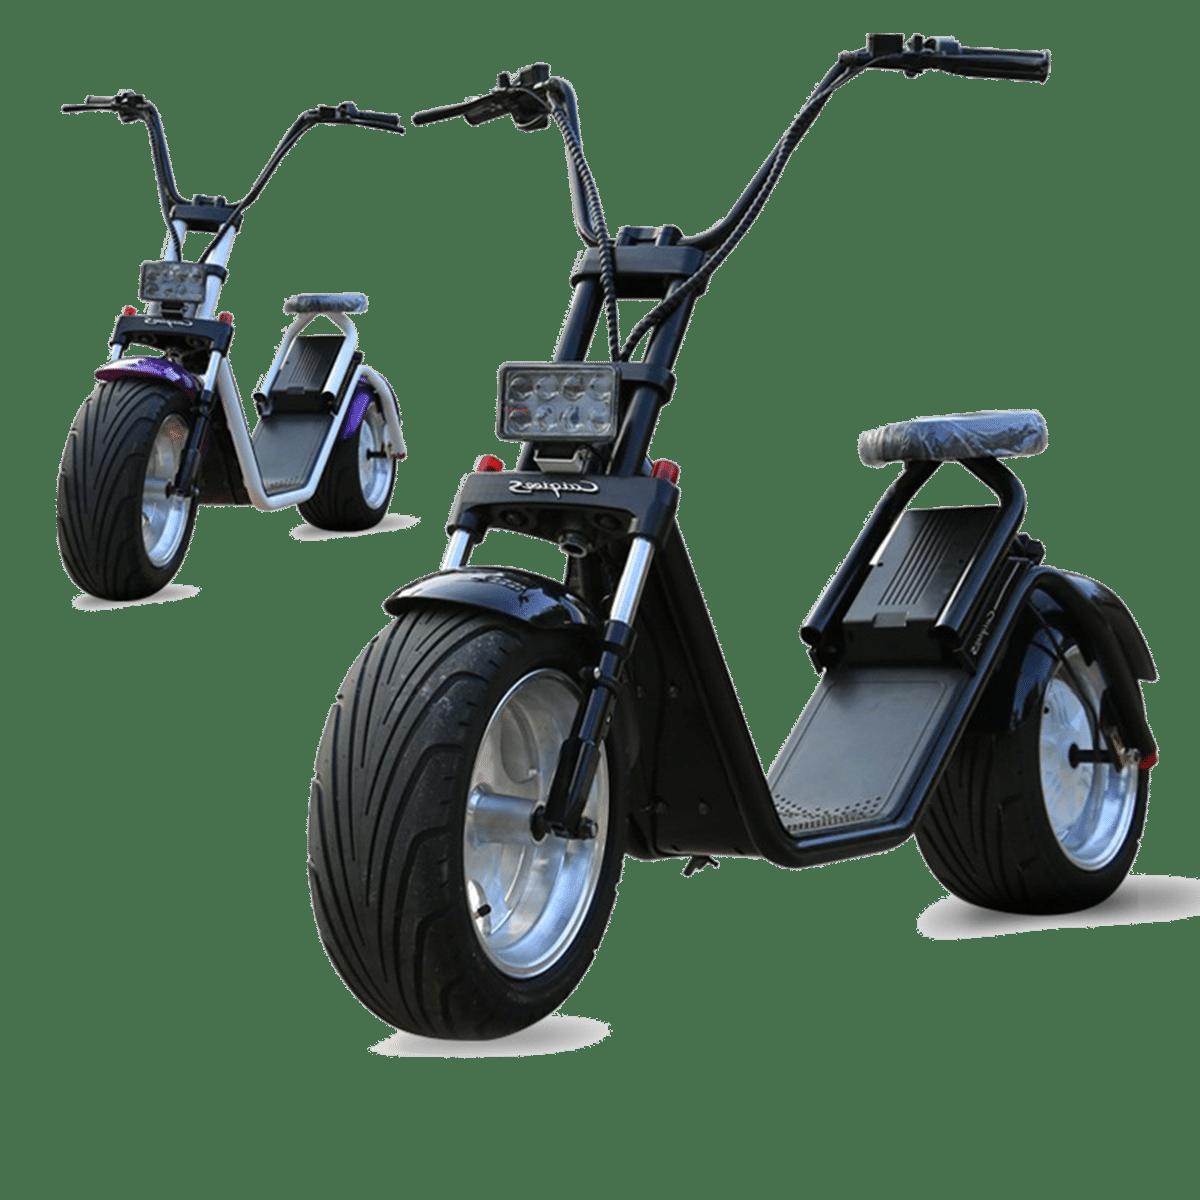 citycoco caigiees noir citycoco scooter electrique. Black Bedroom Furniture Sets. Home Design Ideas